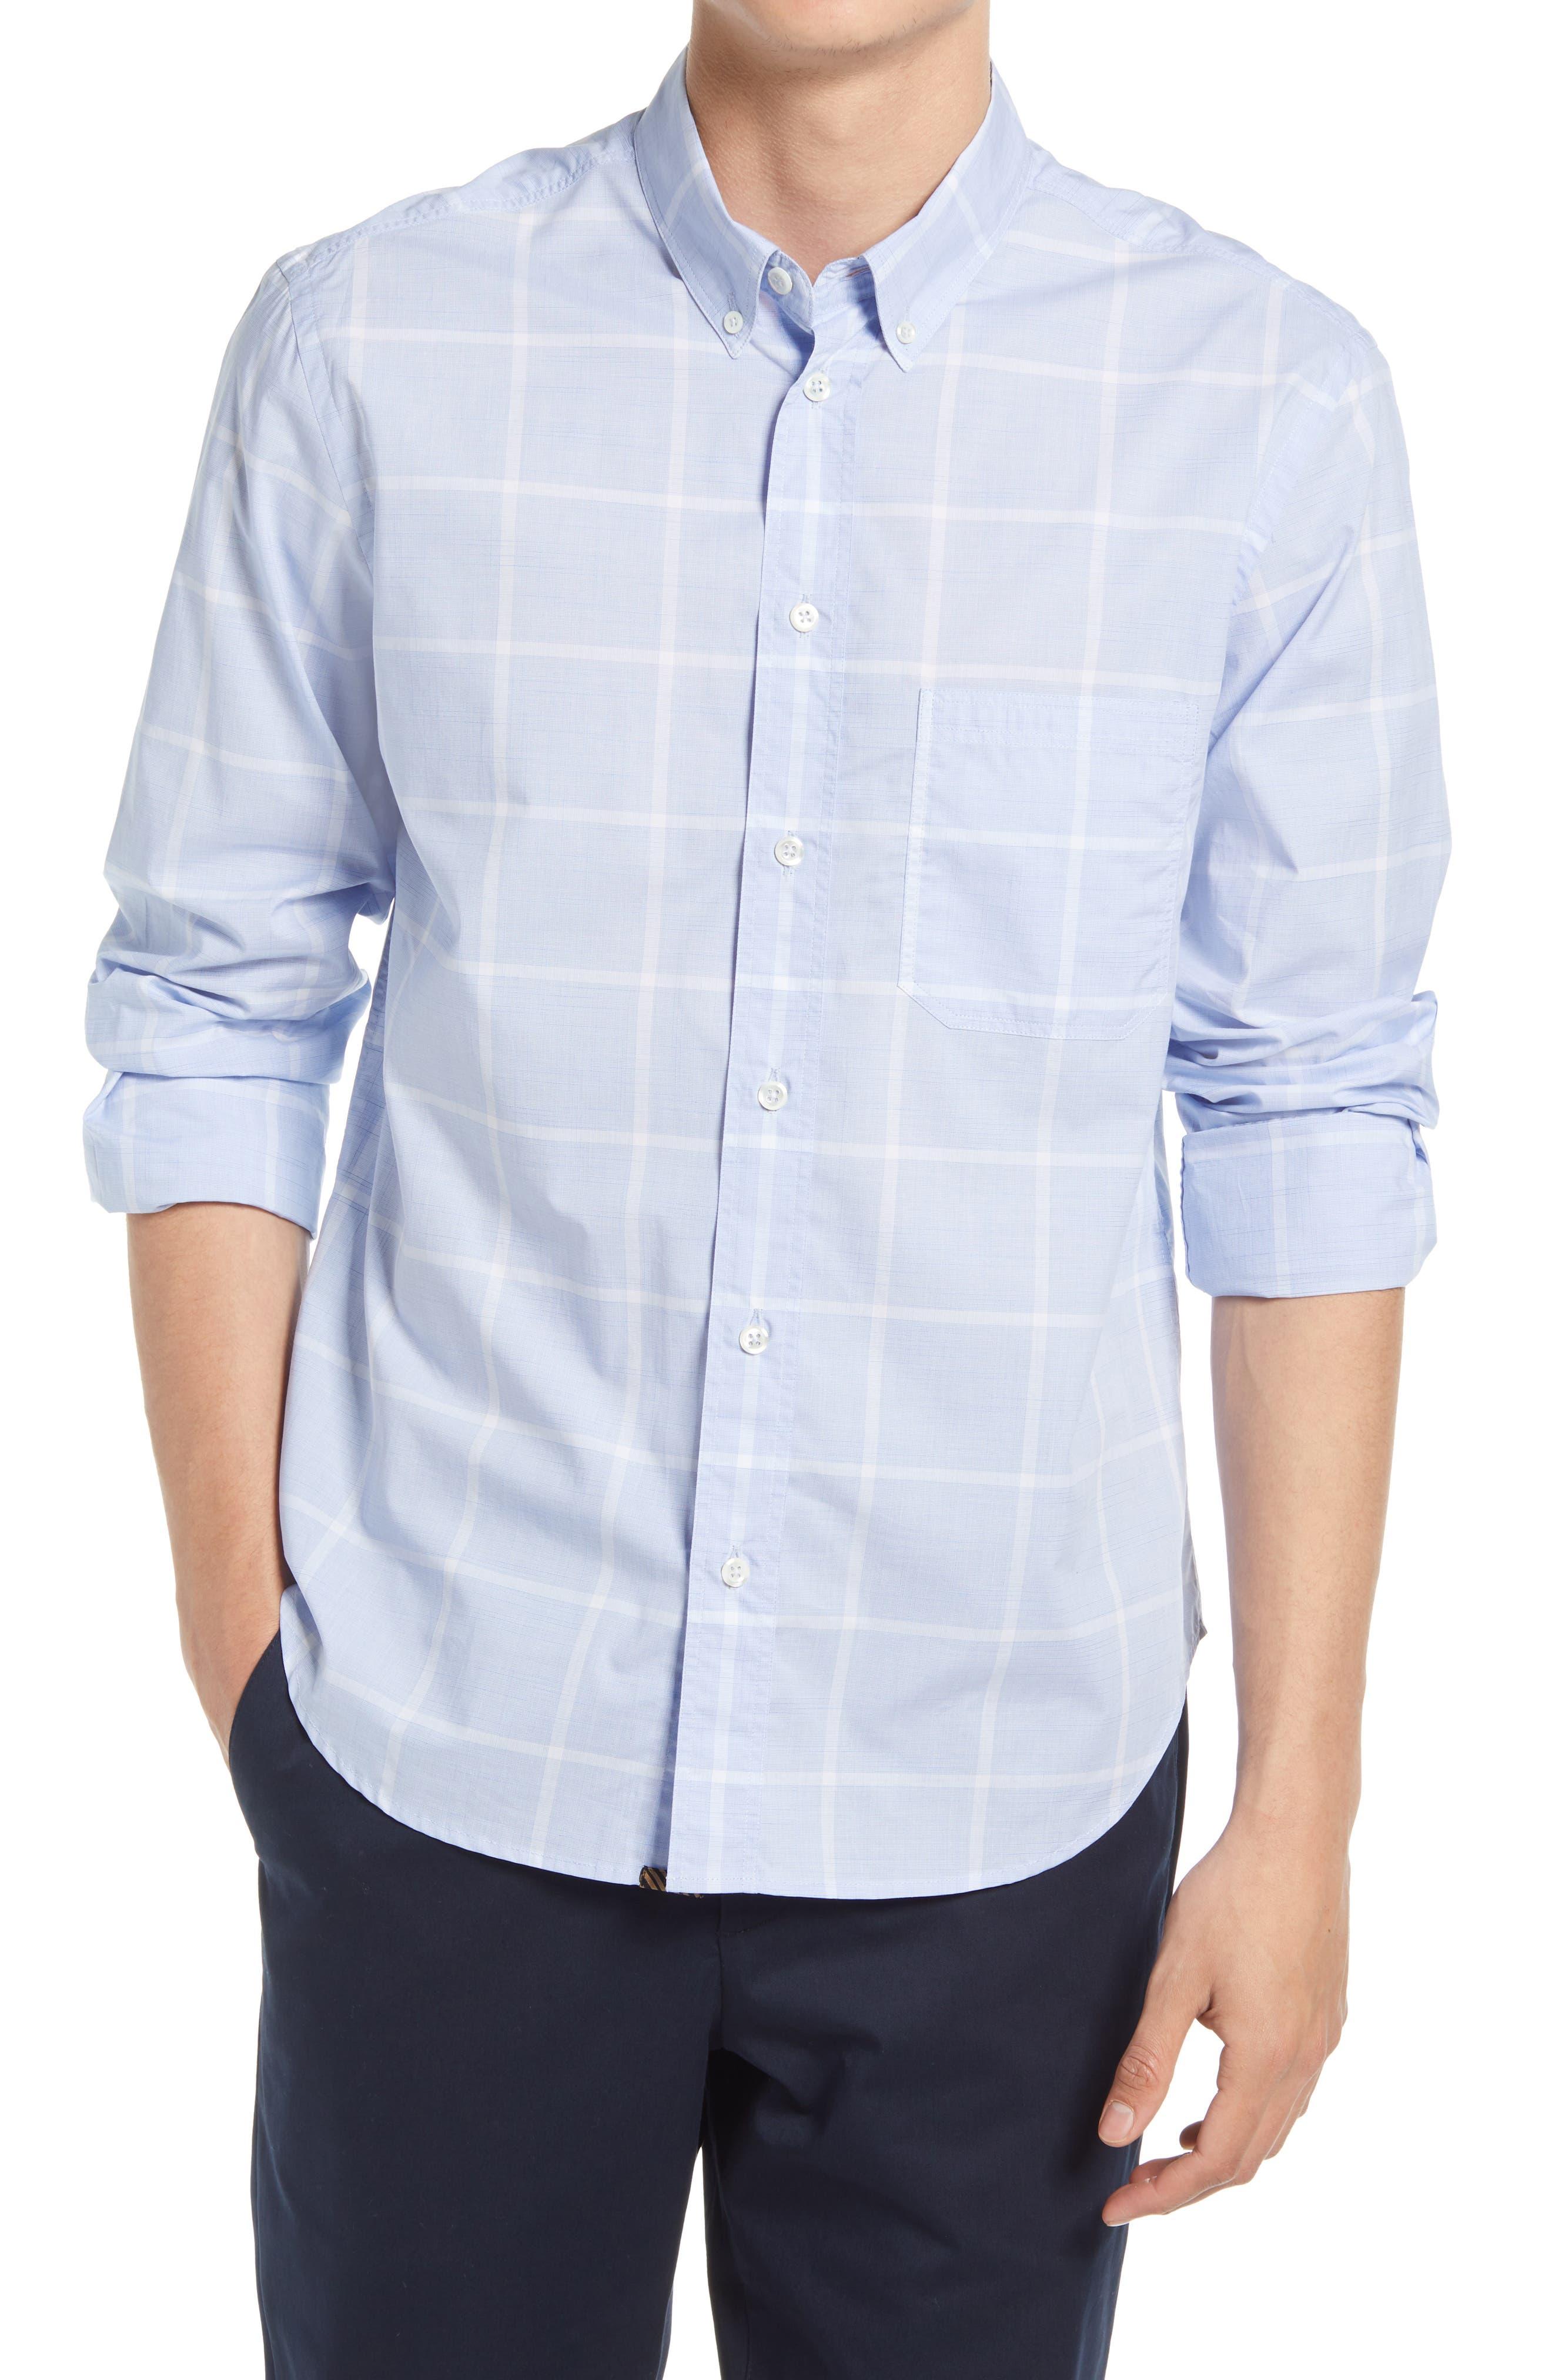 Tuscumbia Check Cotton Button-Down Shirt